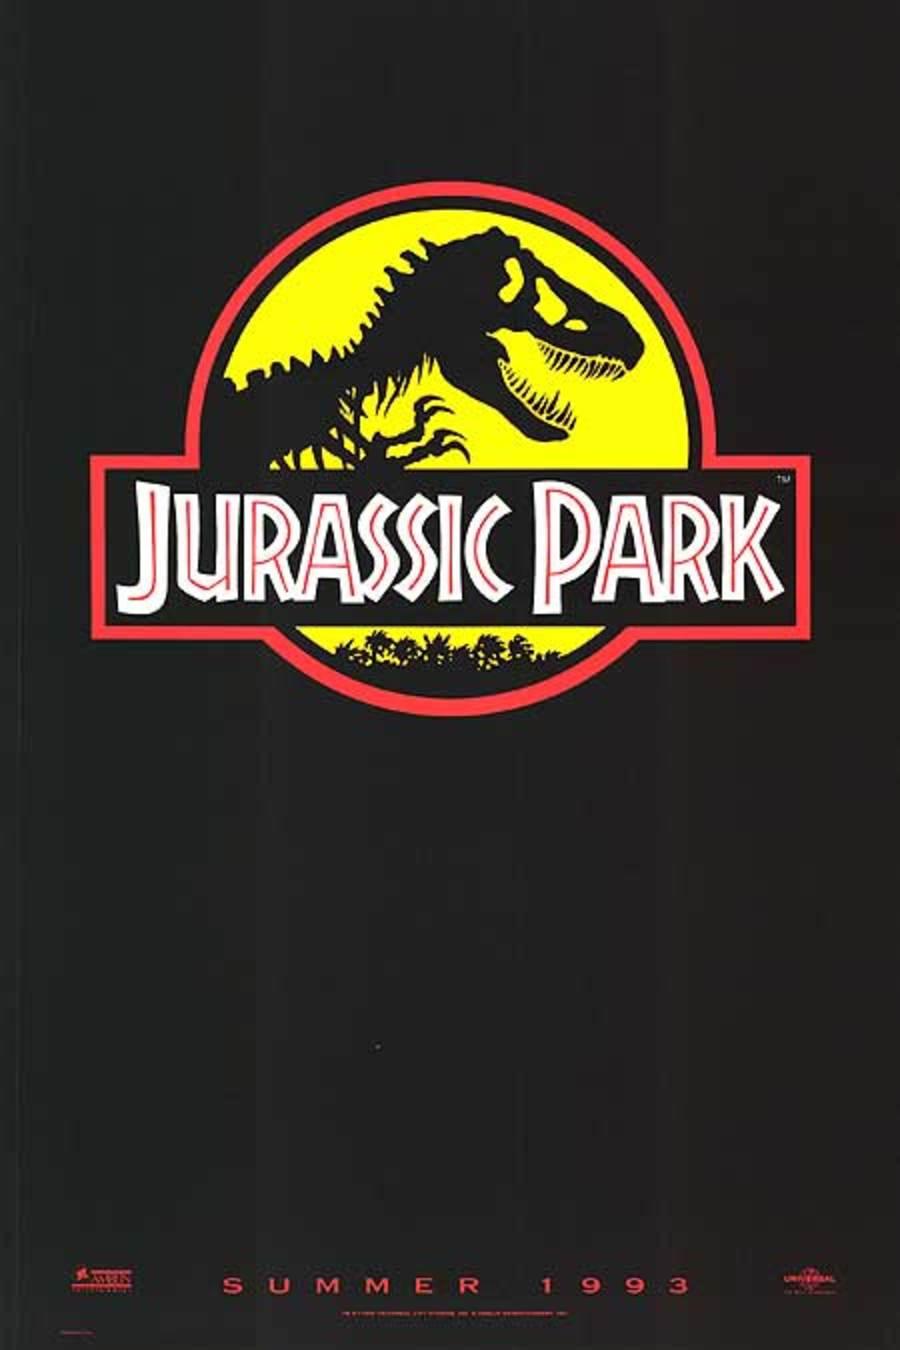 Jurassic Park 1993 Full Movie In Hindi Dailymotion